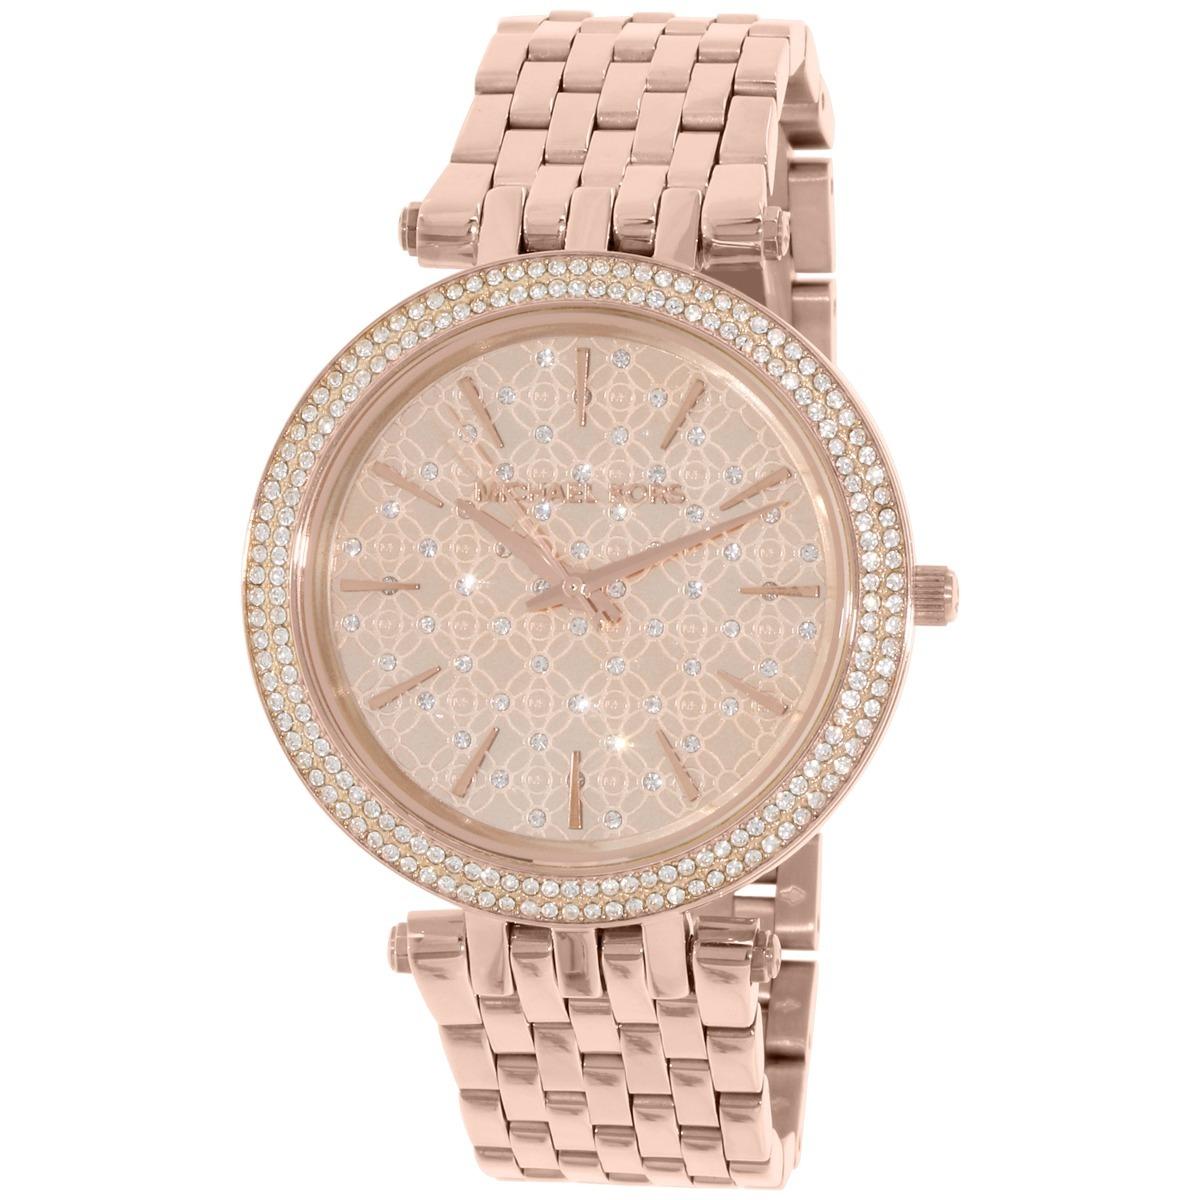 00247bce6e39 reloj michael kors para mujer mk3399 tono oro rosa de acero. Cargando zoom.